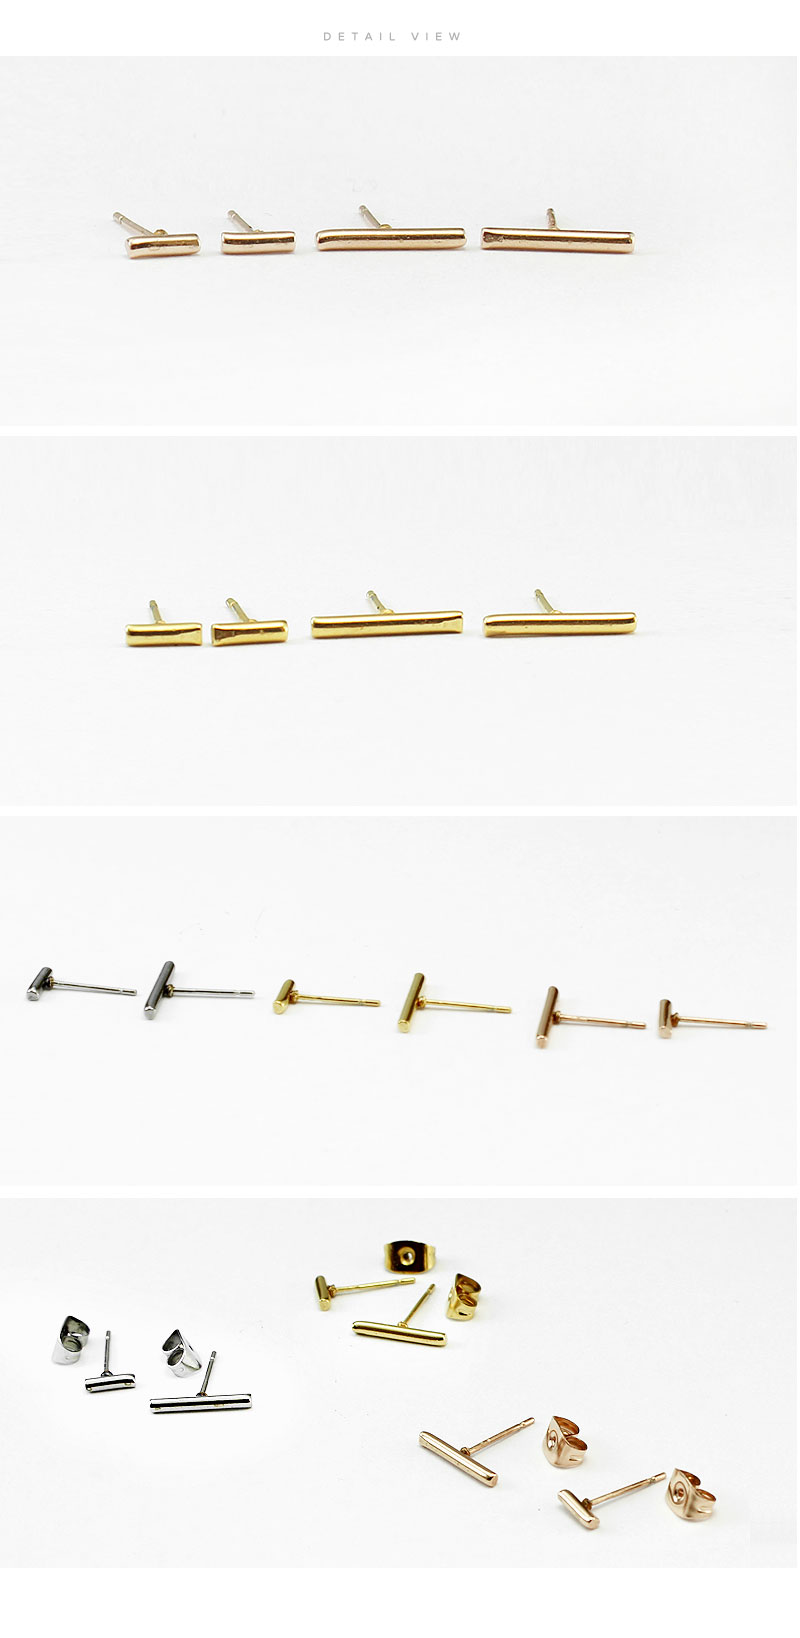 accessories_ear_stud_earrings_korean_asian_style_jewelry_18k_stick_bar_rose_gold_trendy_5